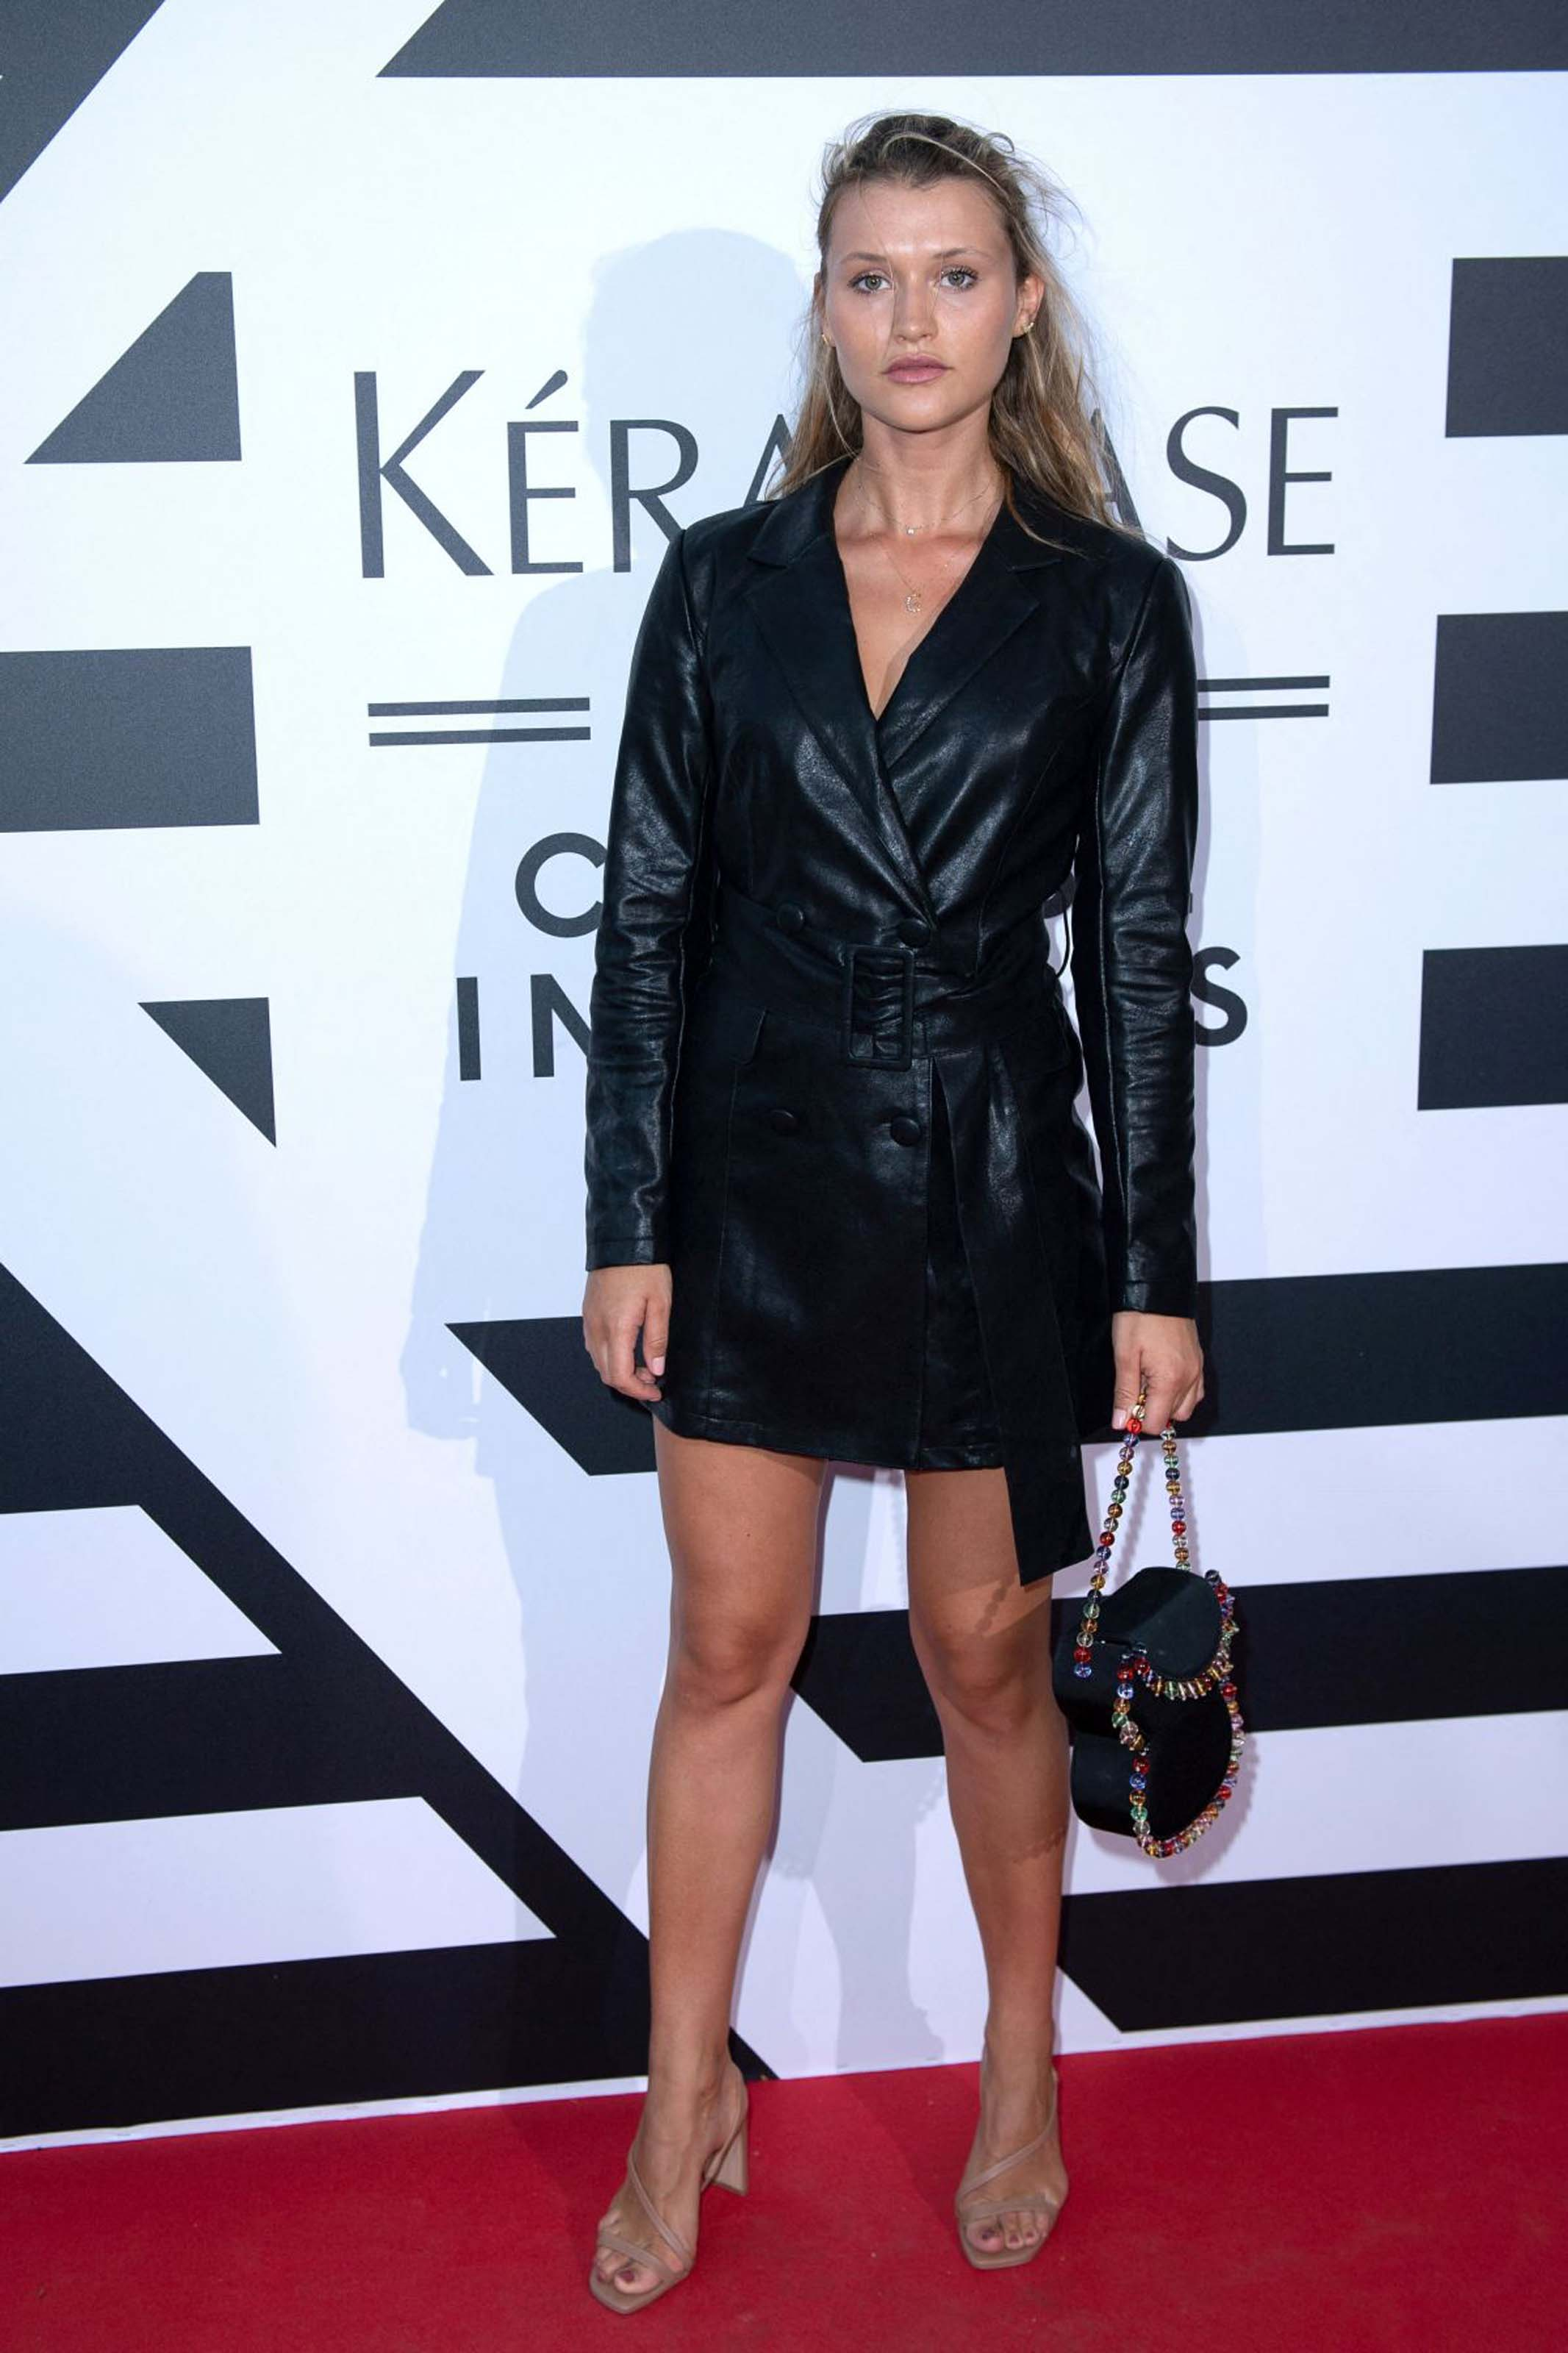 Chloe Lecareux attends Kerastase party